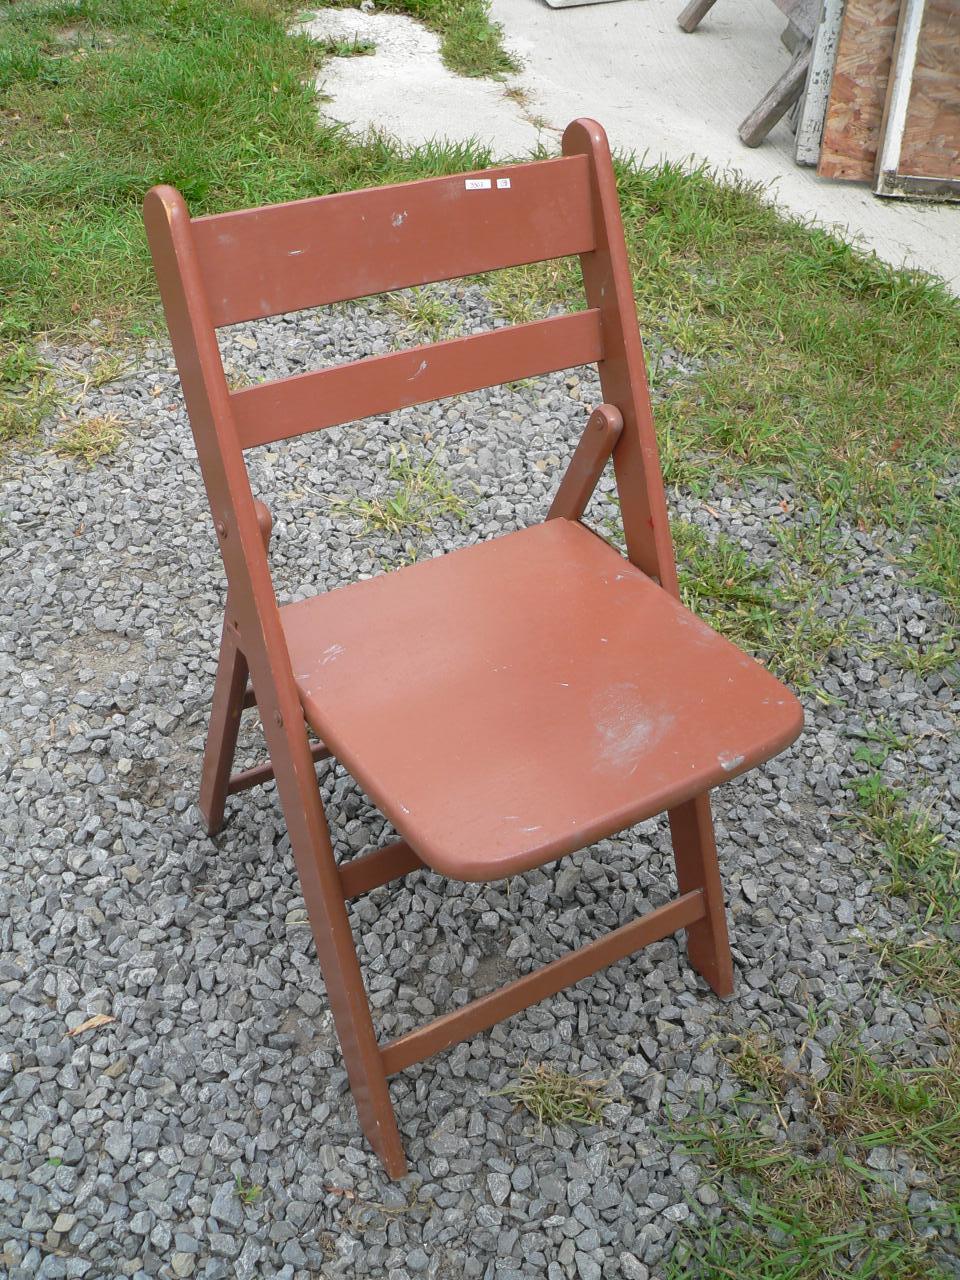 chaise pliante # 3303